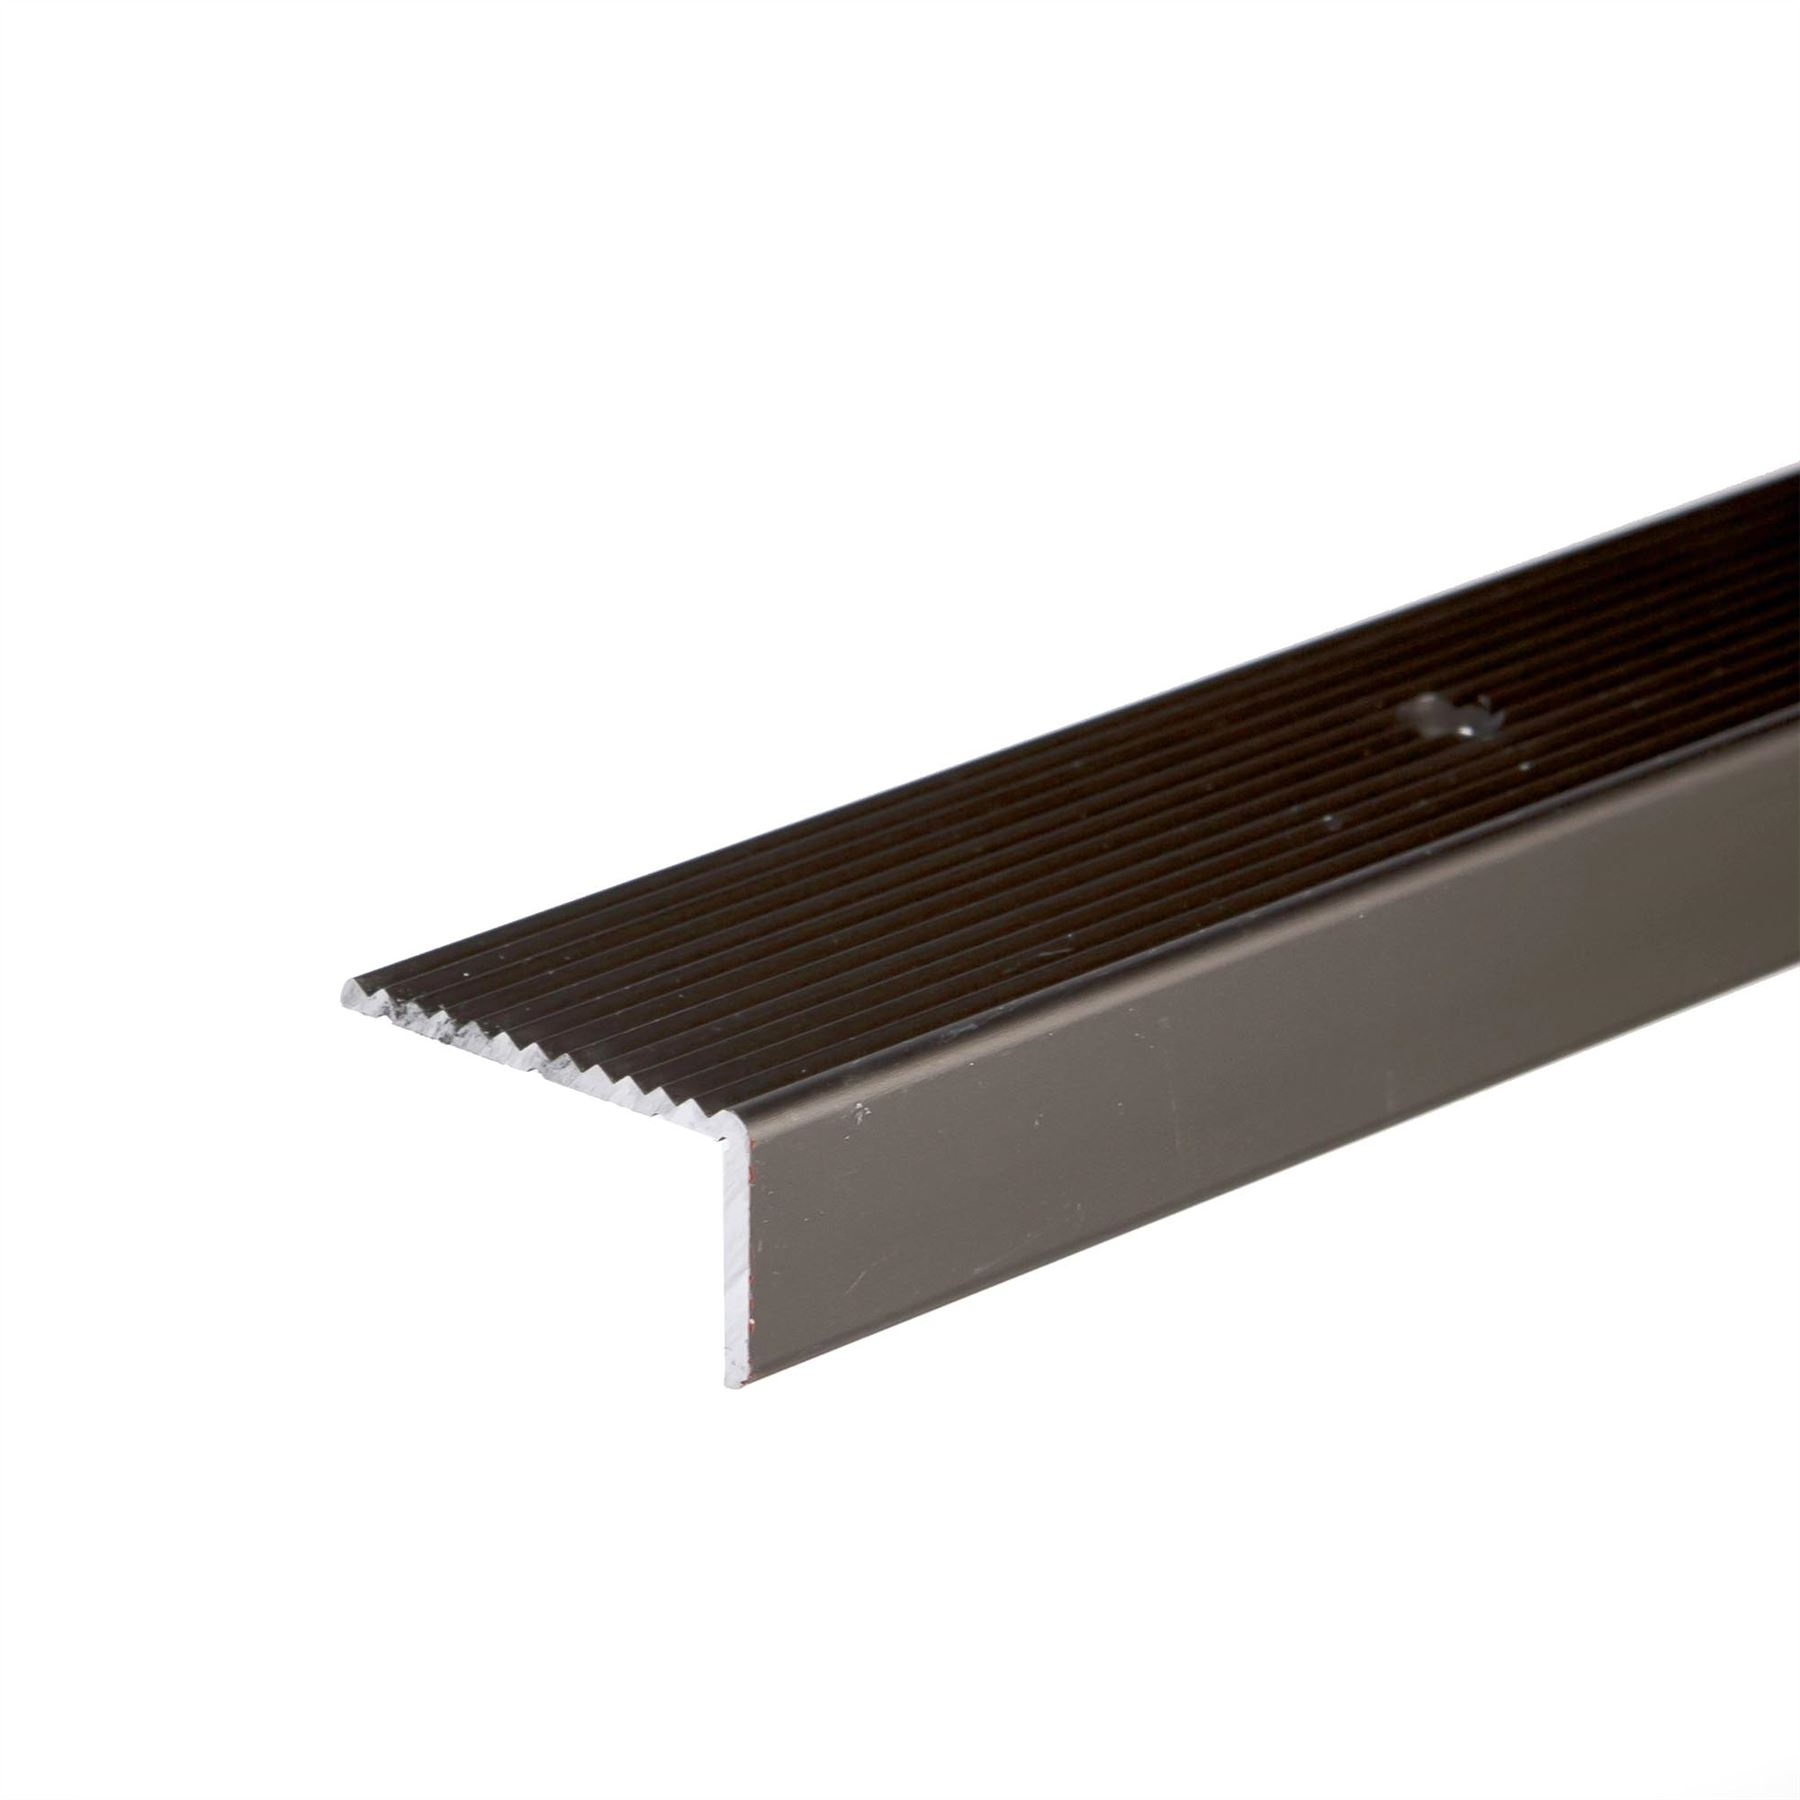 900mm-x-20mm-x-40mm-ANODISED-ALUMINIUM-ANTI-NON-SLIP-STAIR-EDGE-NOSING-TRIM-A33